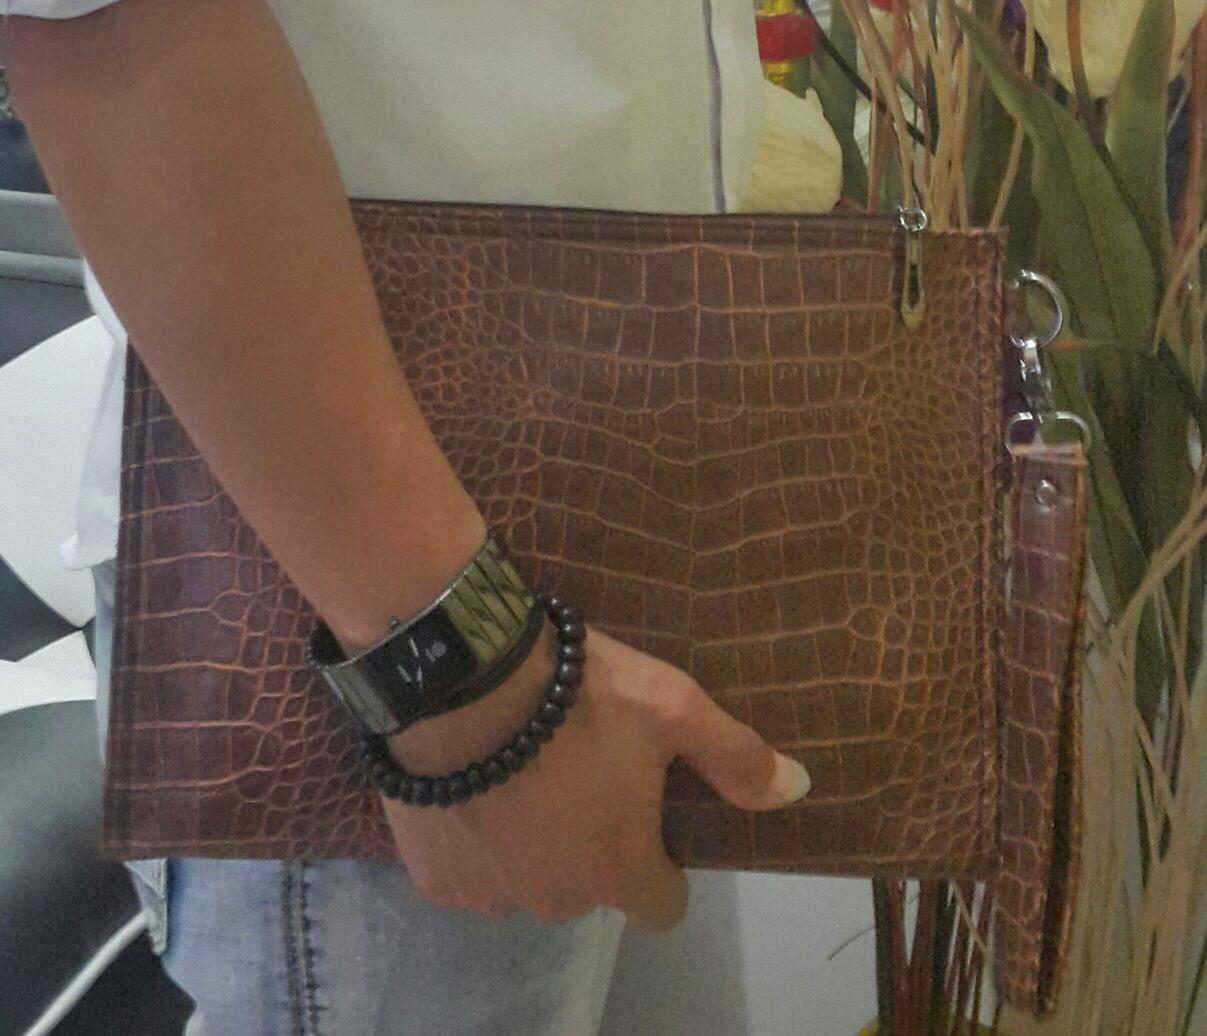 gambar clutch bag kulit buaya harga murah kualitas terbaik